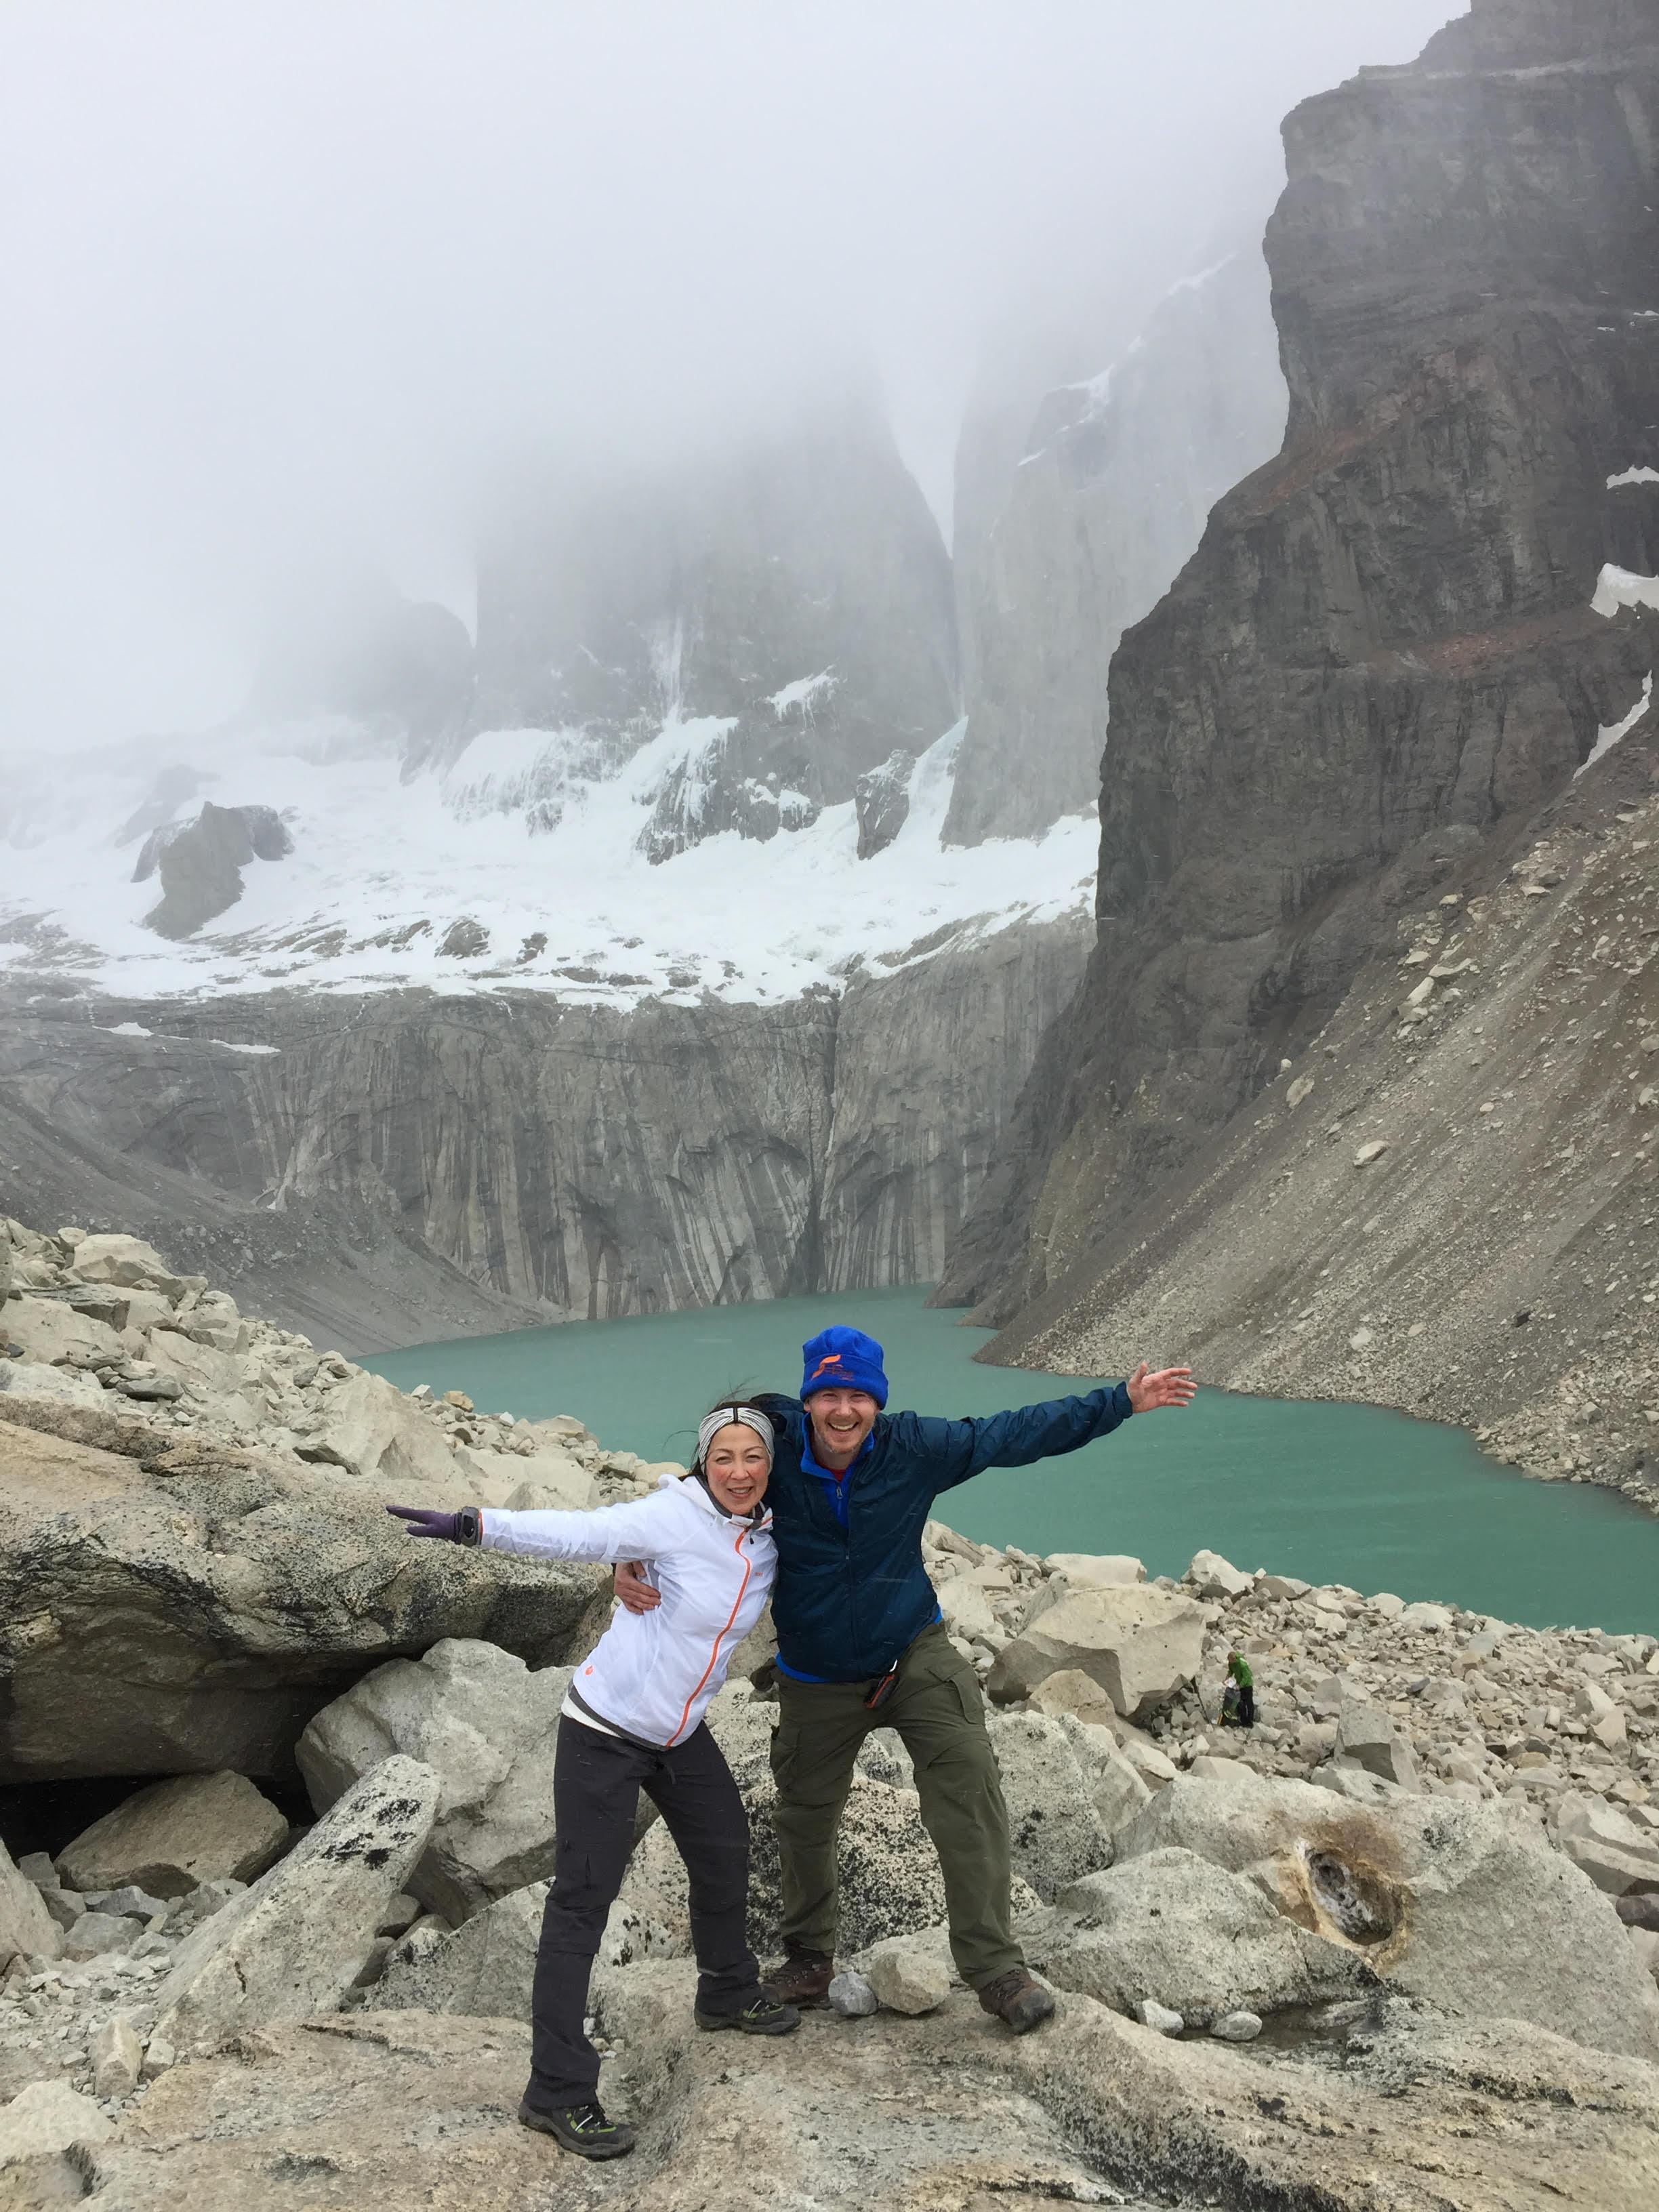 Nui & Steve's Hikes in Torres del Paine & Los Glaciares